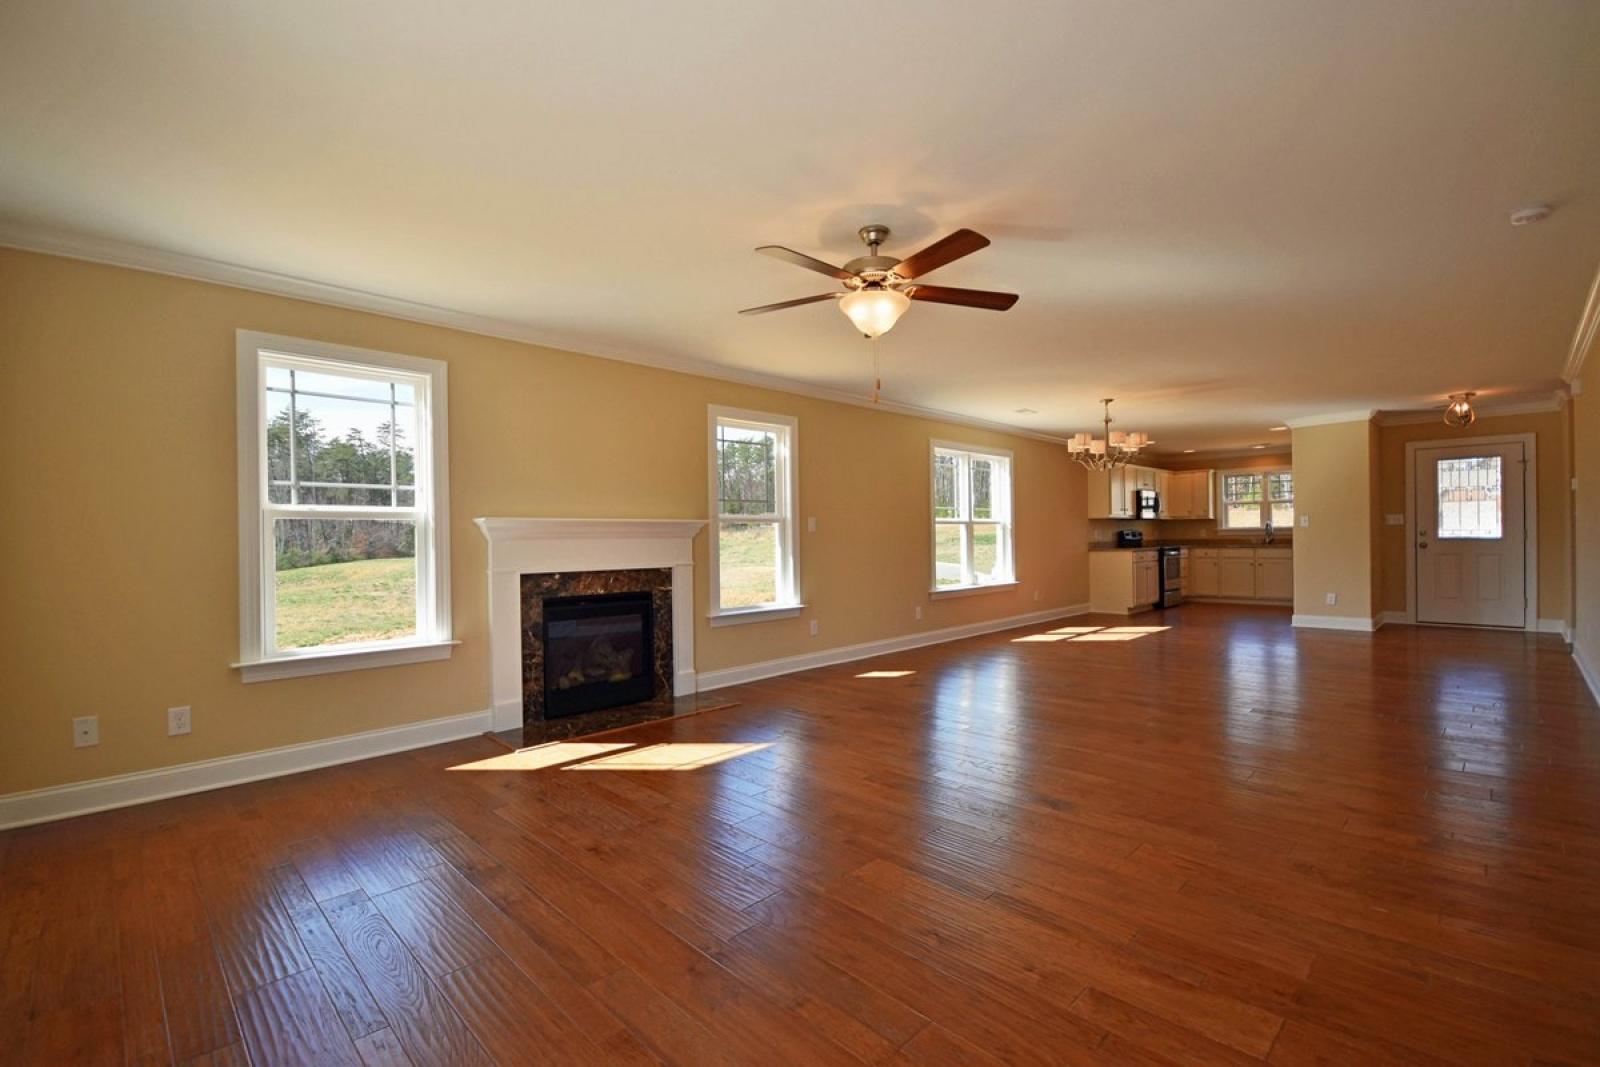 2062 Mackenna Dr., Graham, North Carolina 27253, 4 Bedrooms Bedrooms, ,2 BathroomsBathrooms,The Knolls,For Sale,Clifton,Mackenna,2,1004